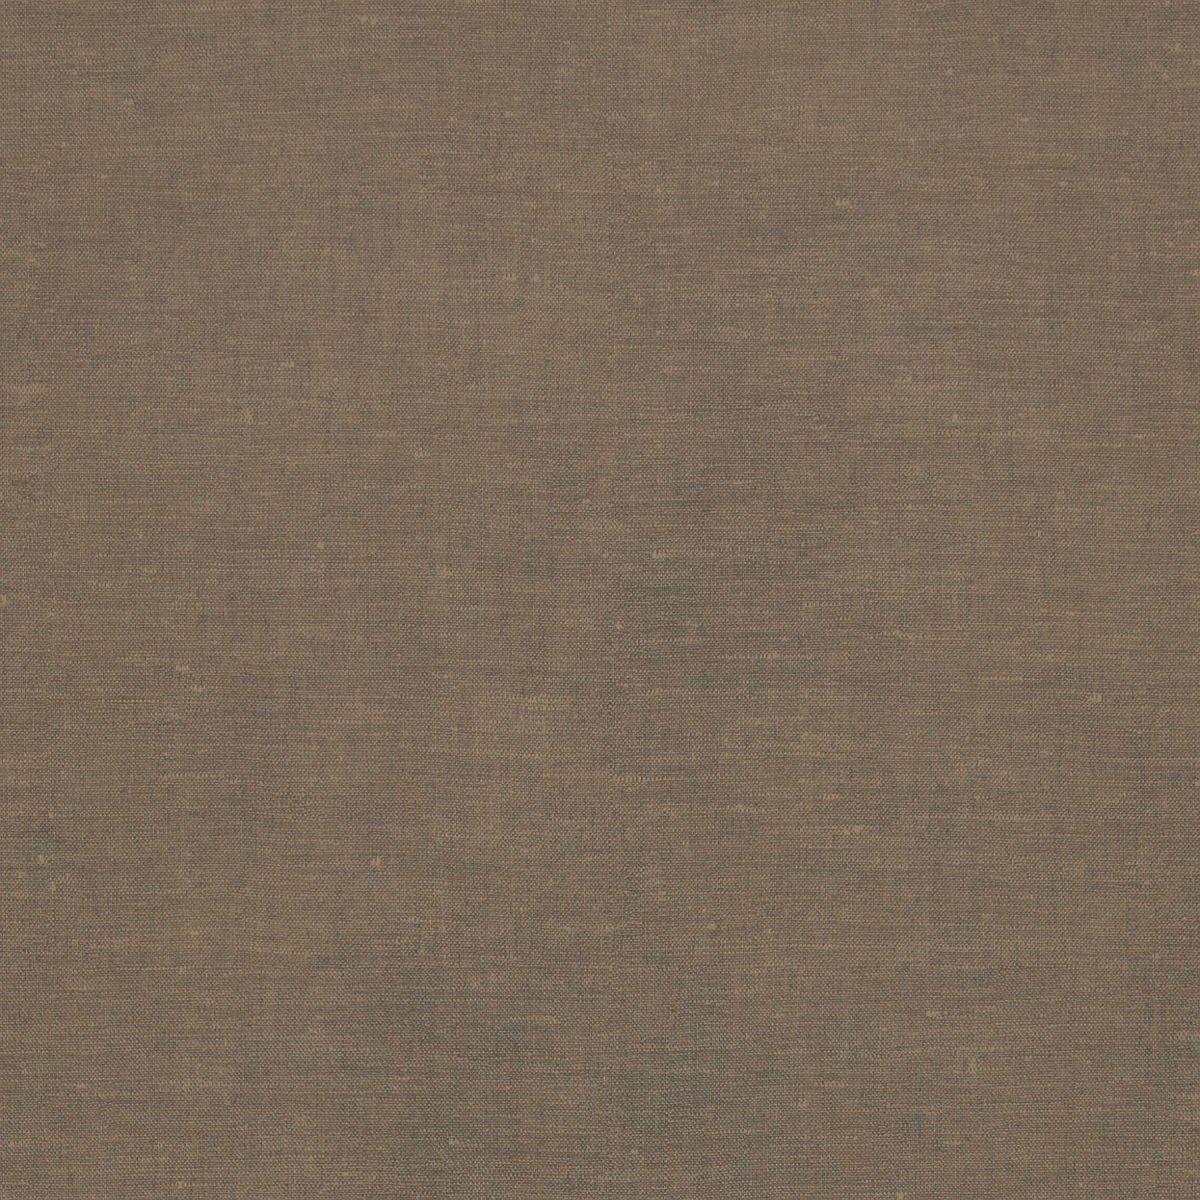 hochwertige tapeten und stoffe b n wallcoverings vliestapete riviera maison 18344 decowunder. Black Bedroom Furniture Sets. Home Design Ideas